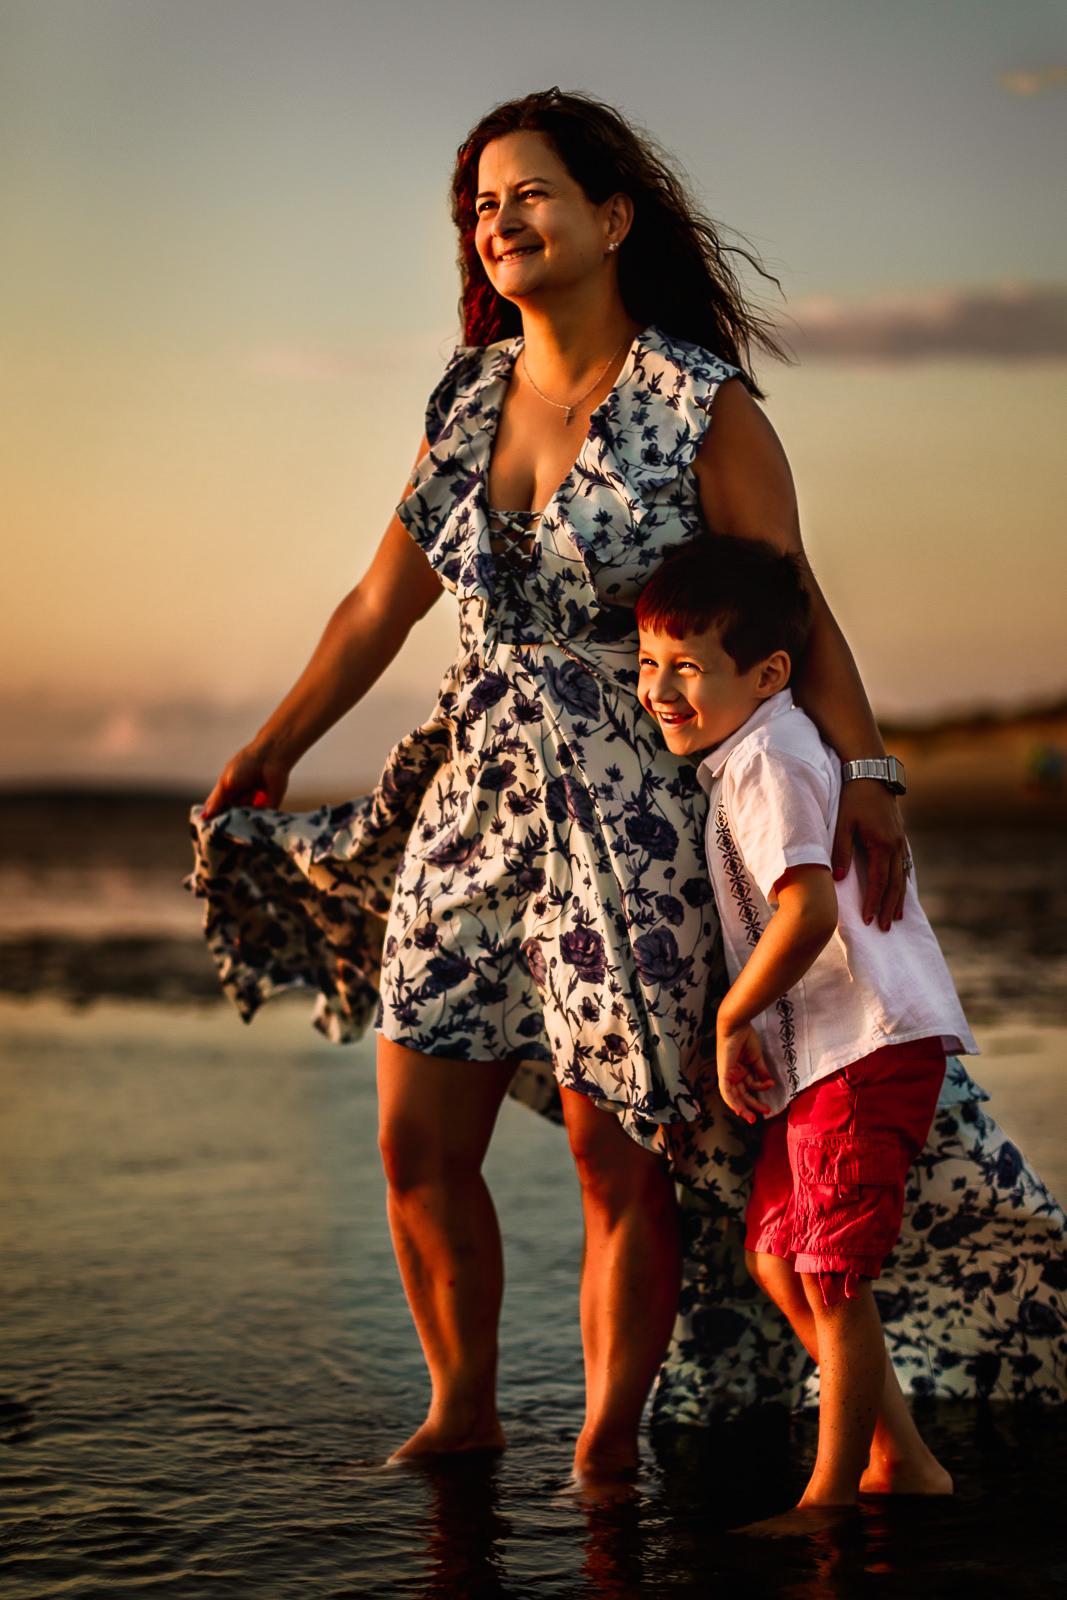 Cape Cod Beach Family Photo Session -21